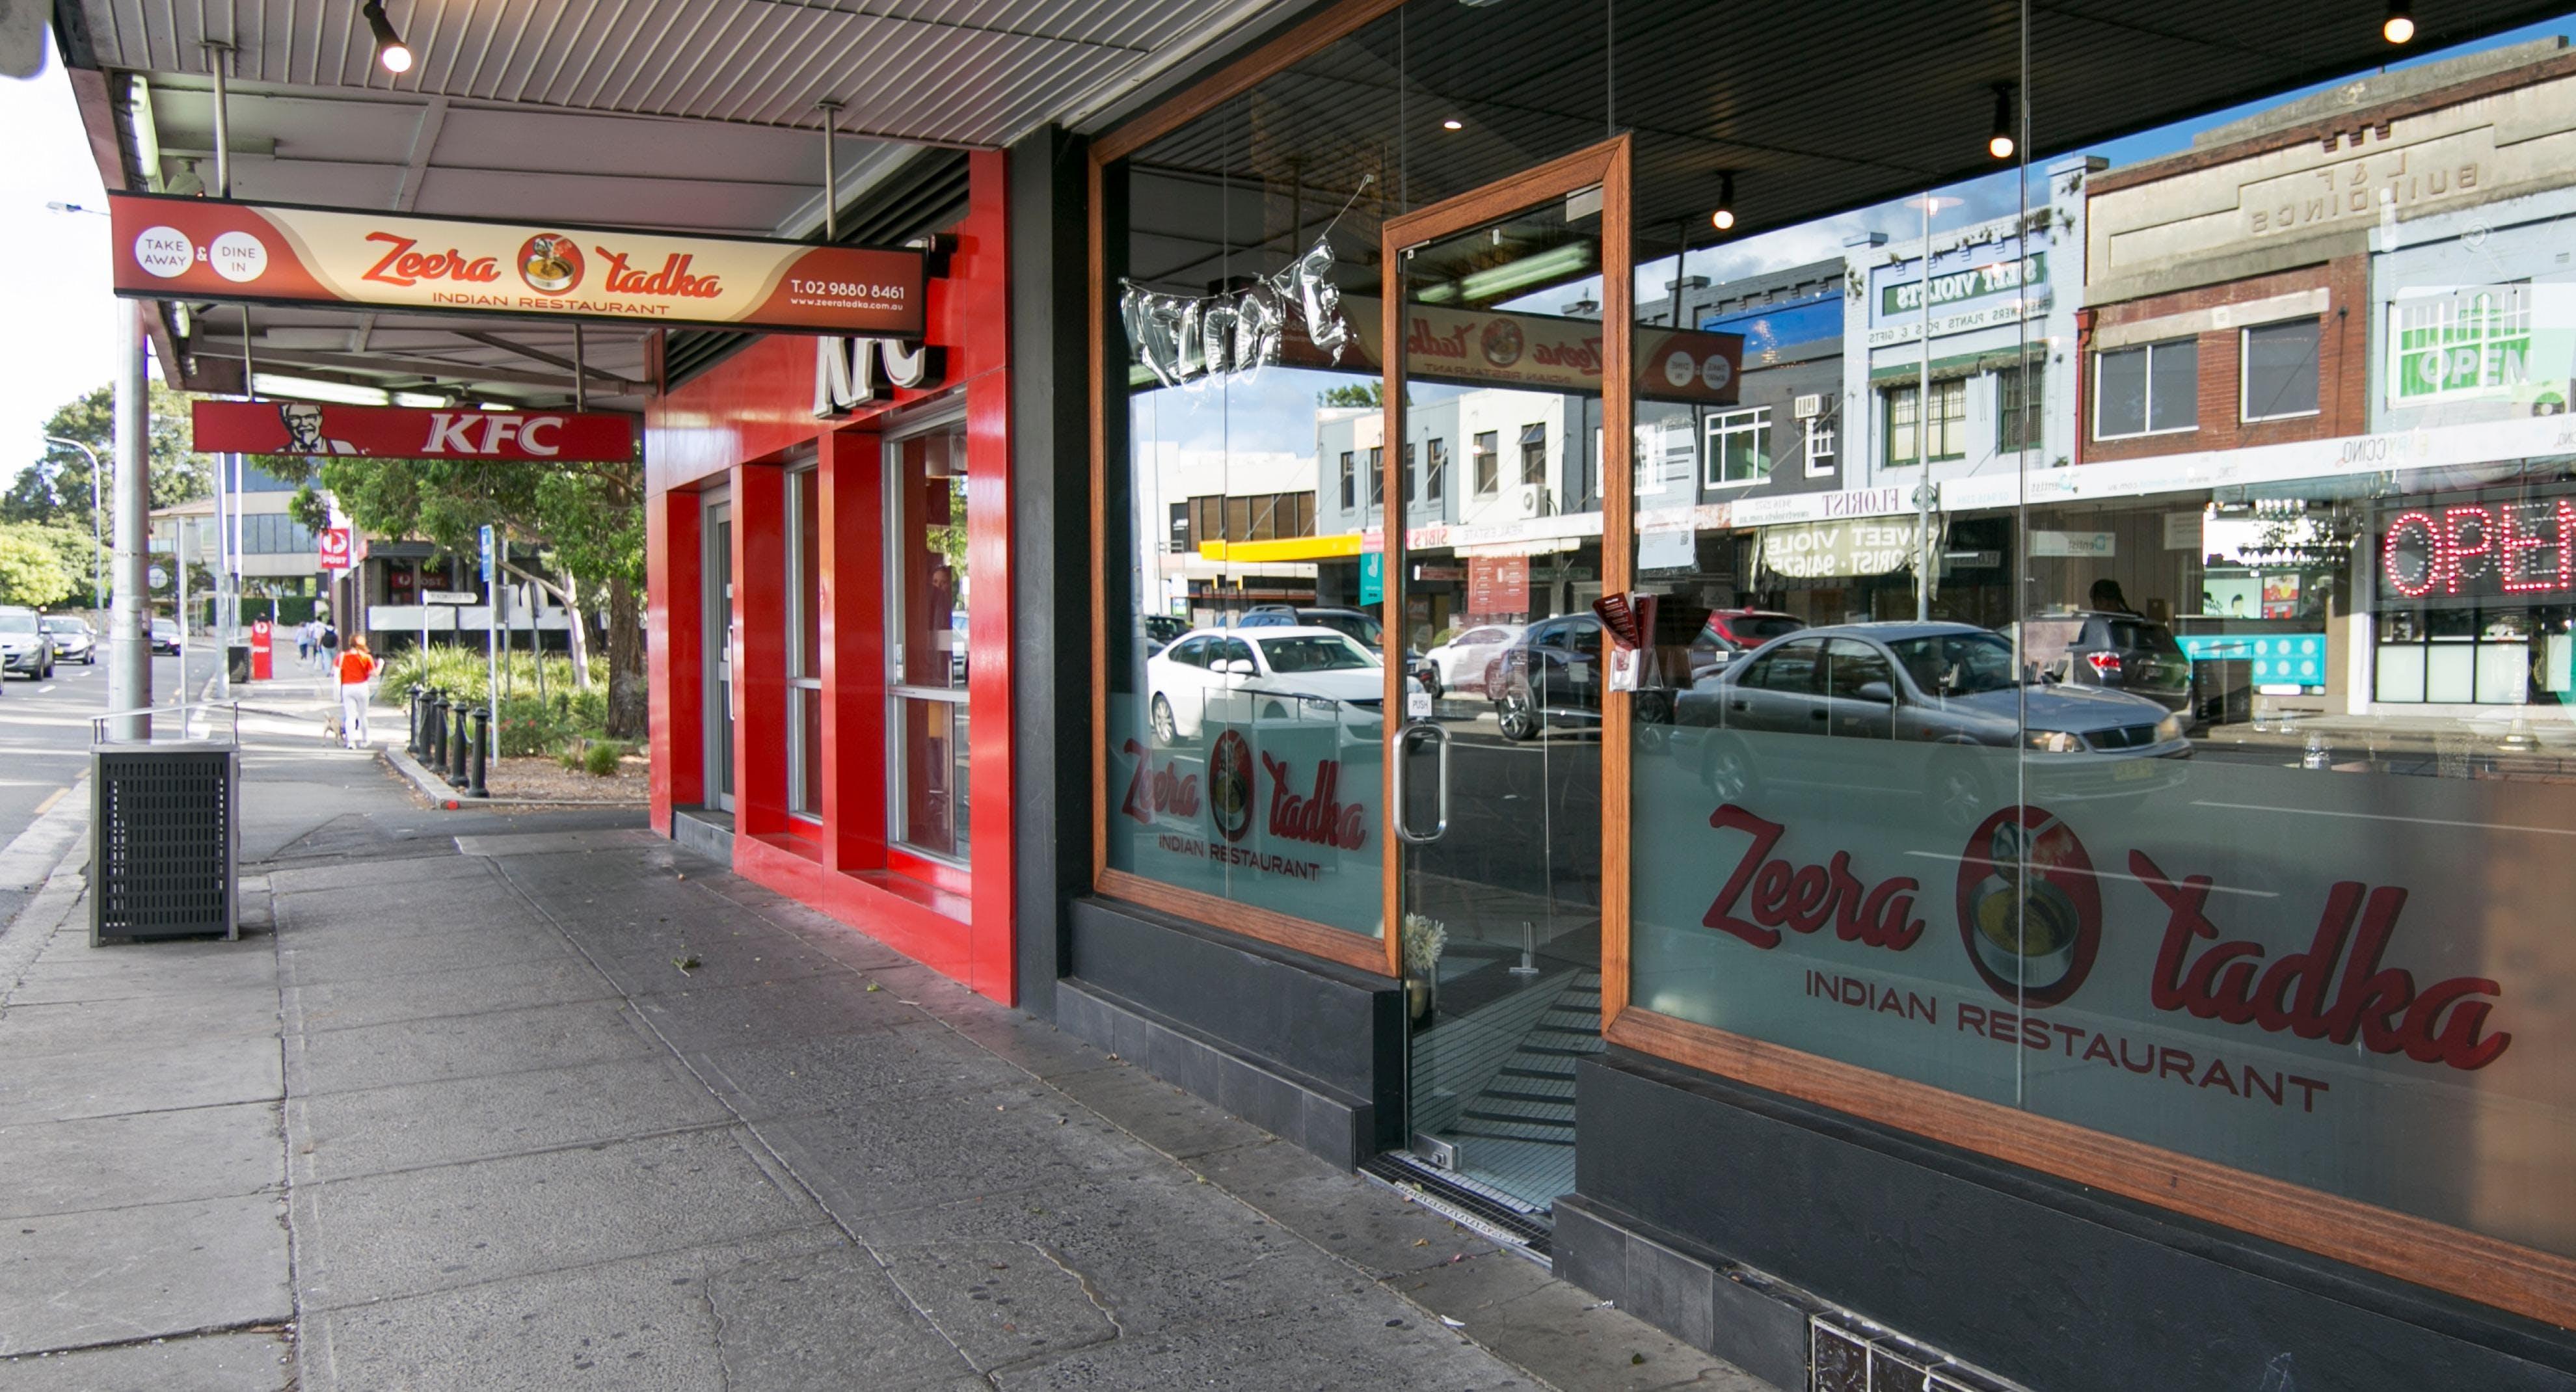 Zeera Tadka Indian Restaurant Sydney image 2